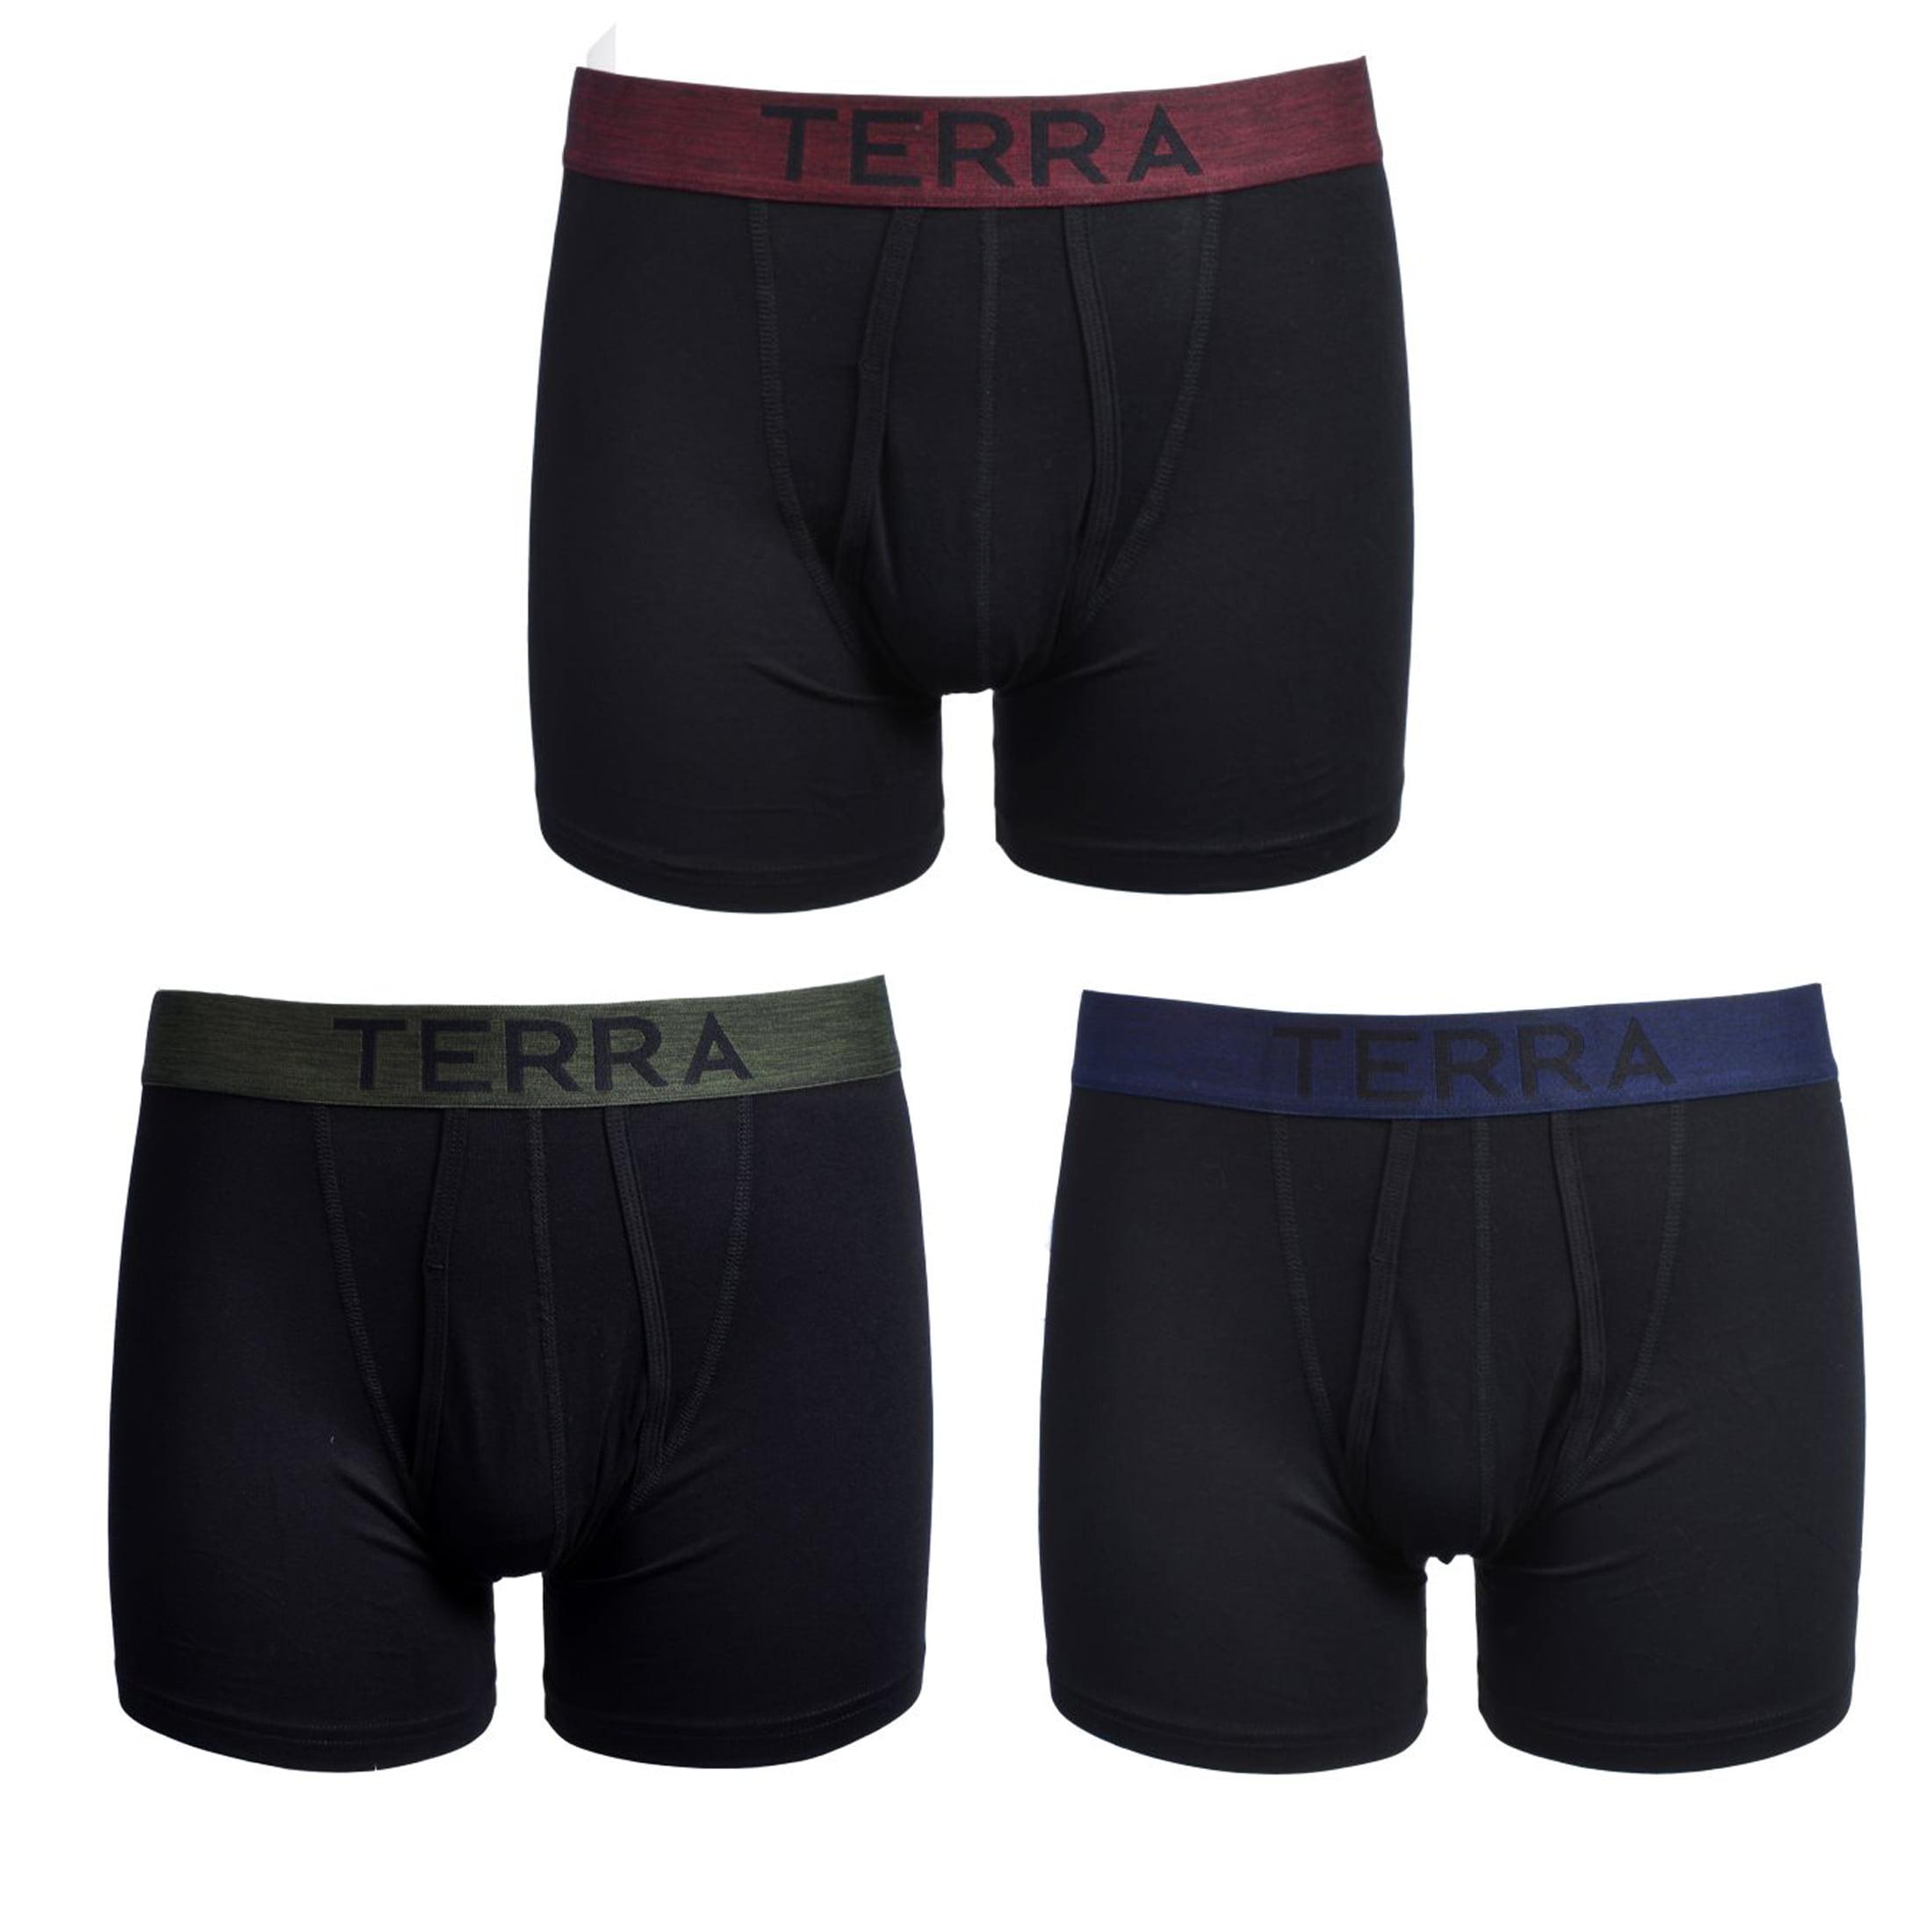 1a4cc2f7ecb9 Terra - Men's Boxer Briefs Assorted Mens Underwear with Cotton Classic  Stretch , 3-Pack by Terra - Walmart.com